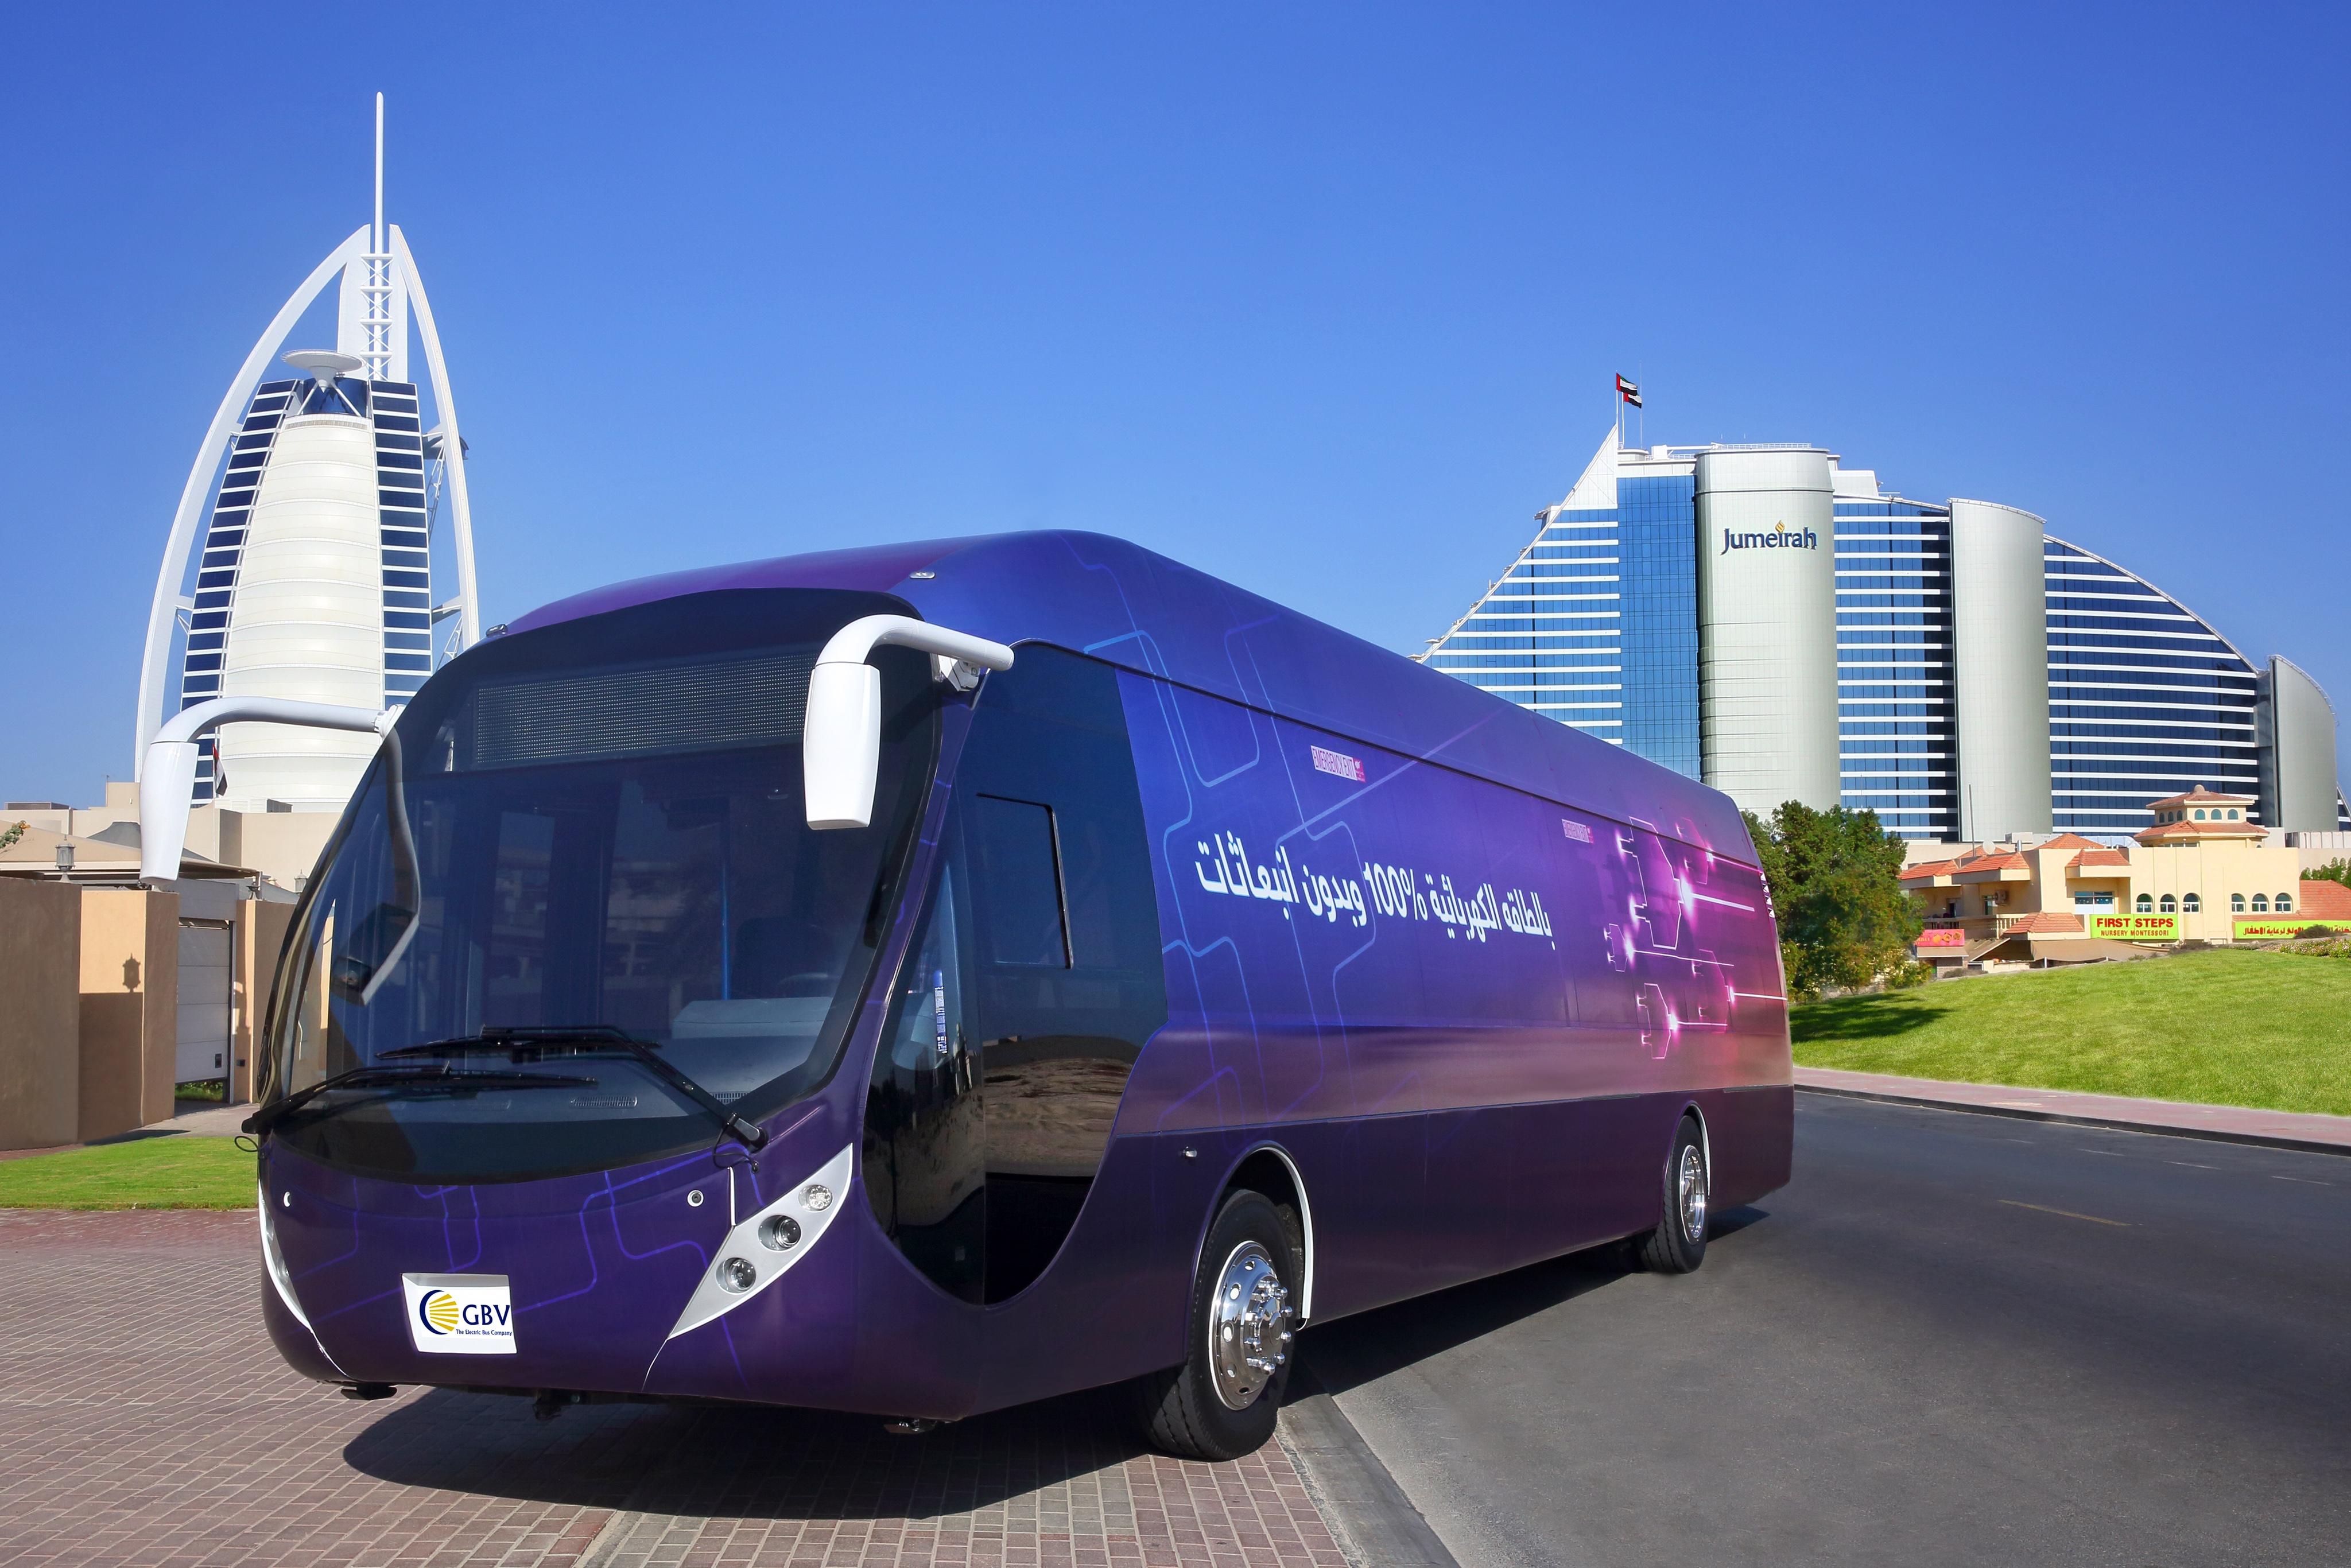 Global Bus Ventures